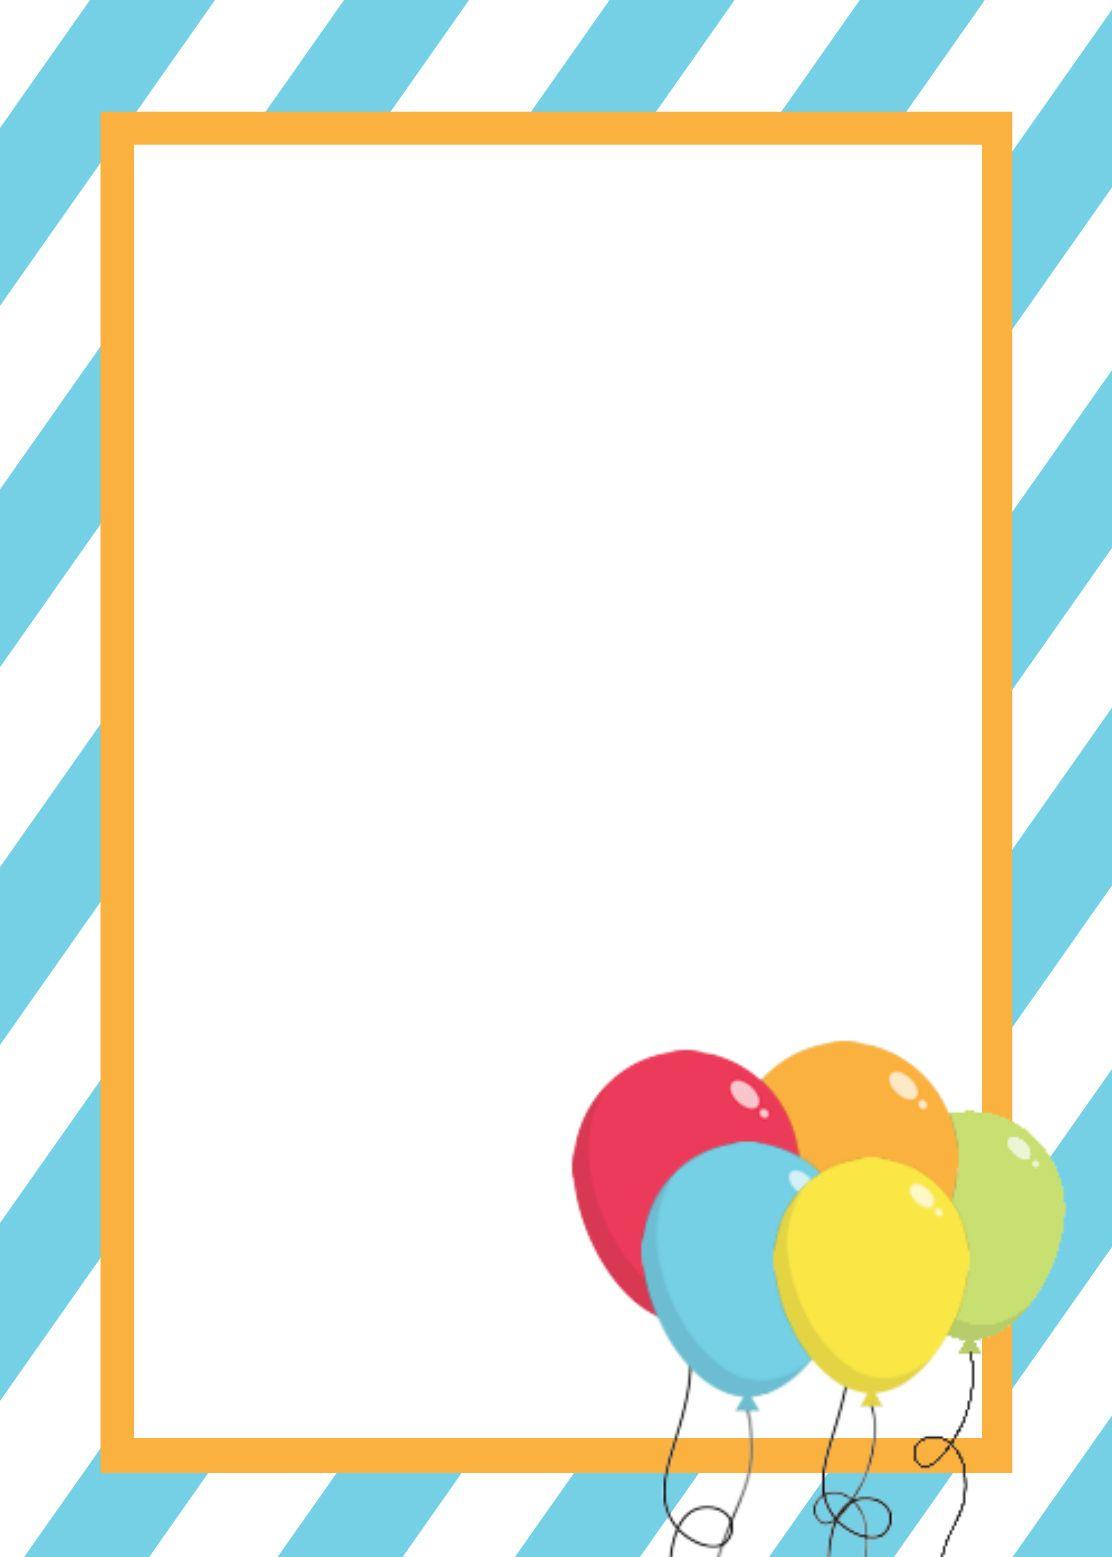 Free Printable Birthday Invitation Templates | Birthday Ideas And - Free Printable Birthday Invitation Templates